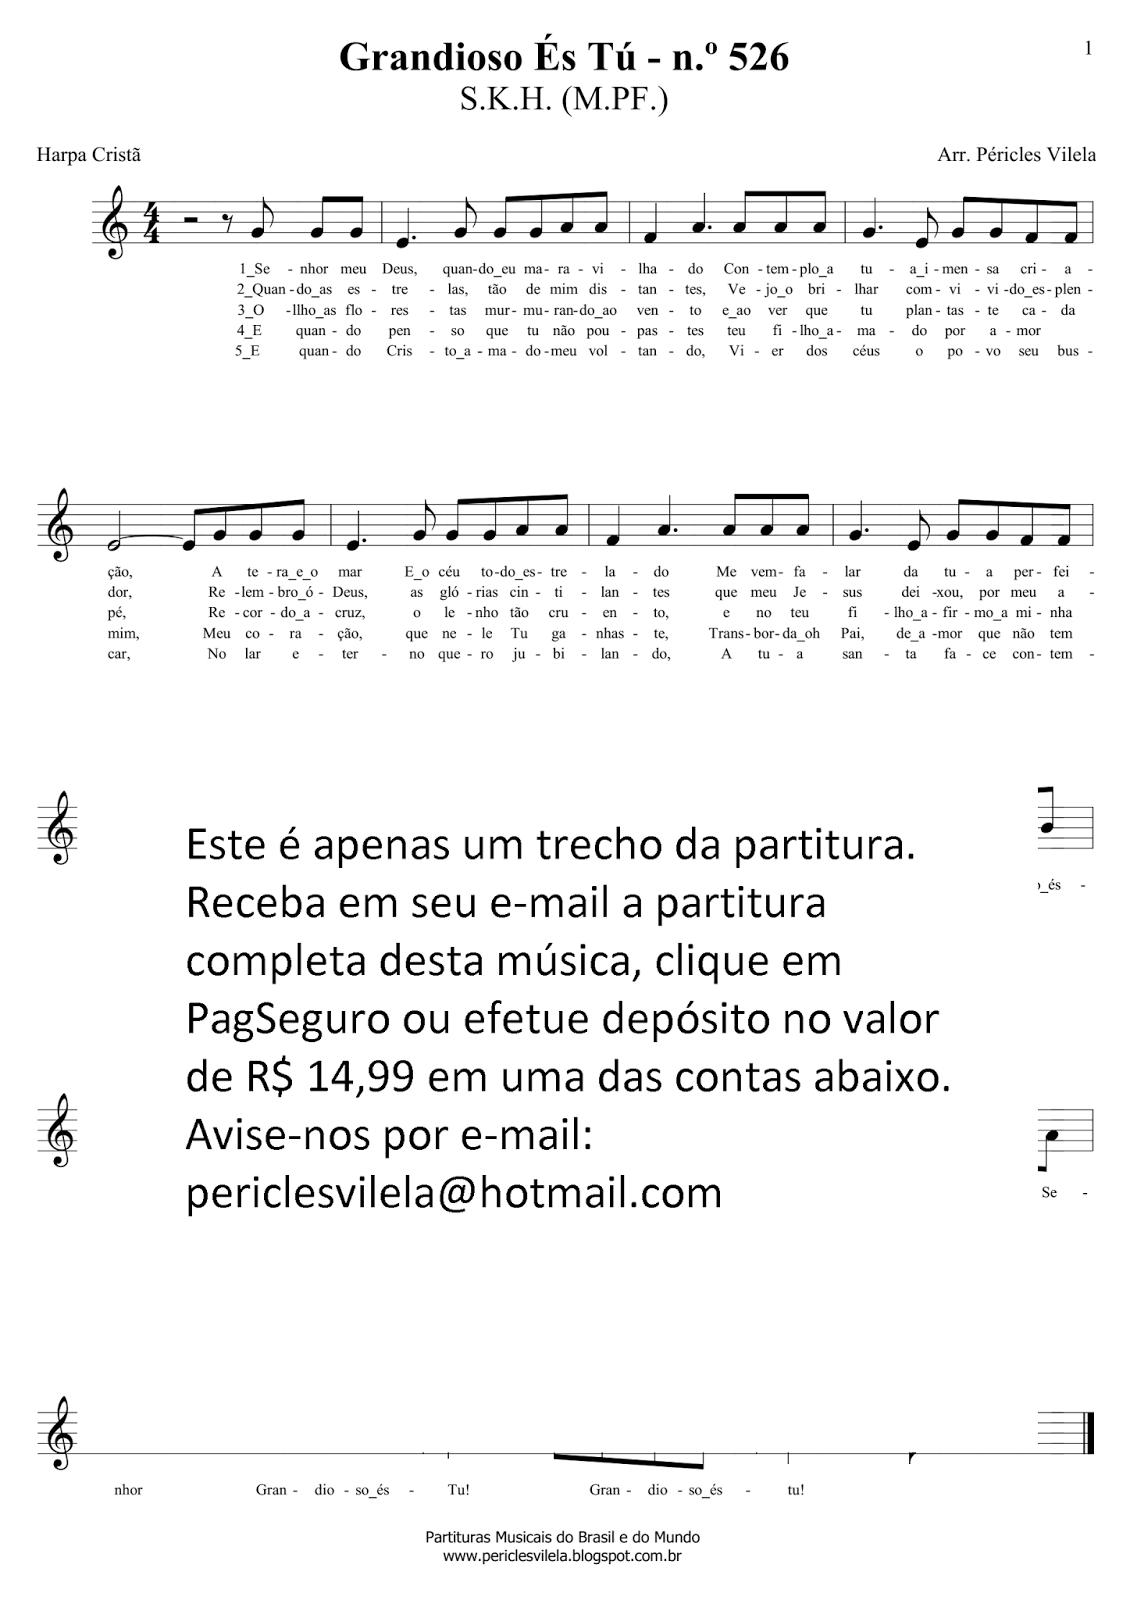 Partituras Musicais: Grandioso és tu - Larissa Manoela - Harpa Cristã - n.º  109